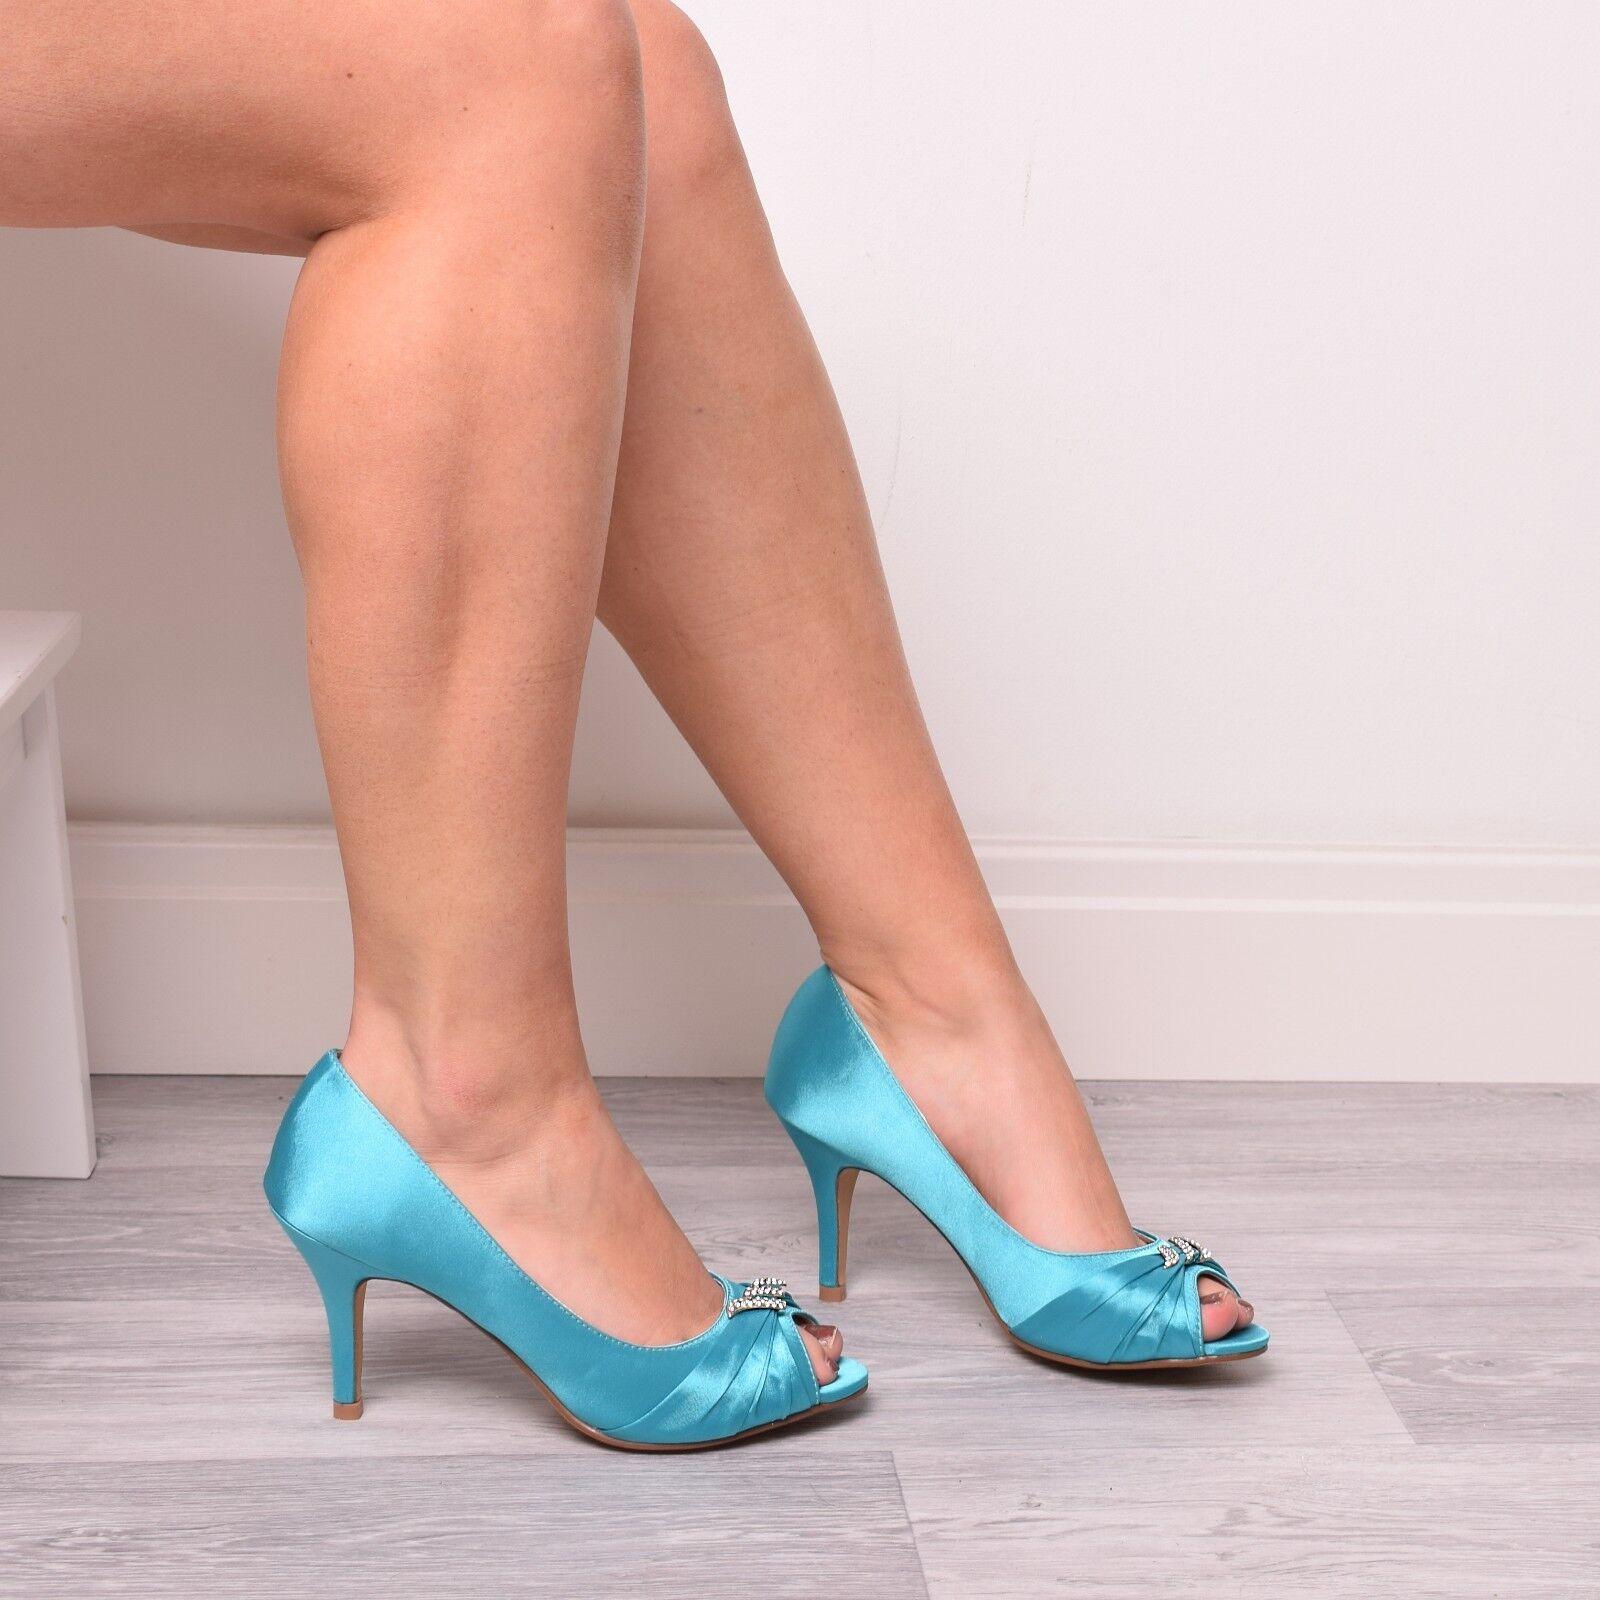 Ladies Womens Wedding Shoes Bridal Bridemaids Prom Diamante Teal Shoes Size